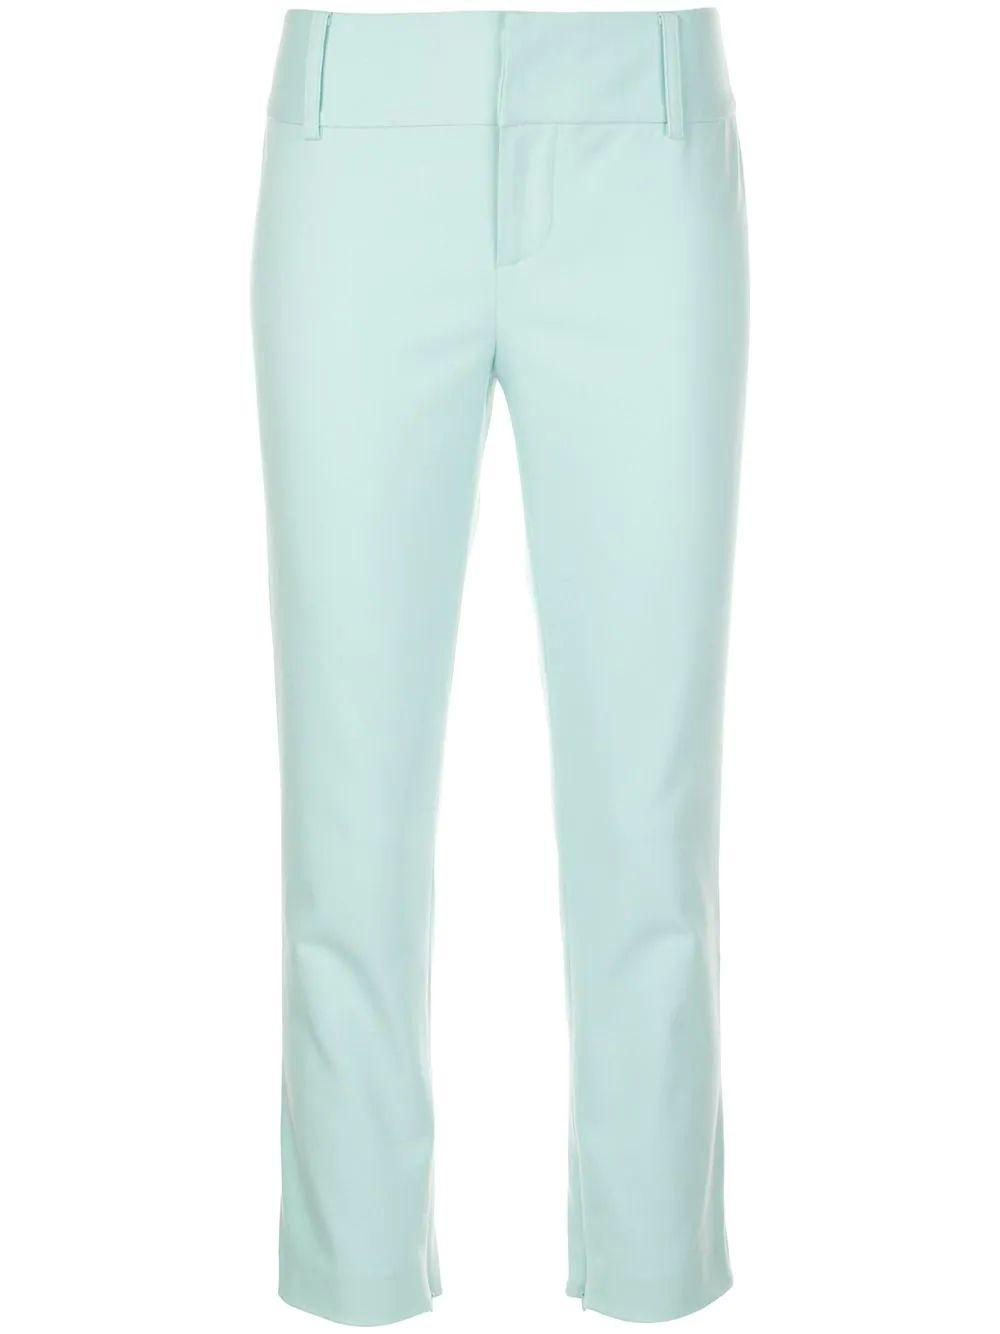 Stacey Slim Ankle Pant Item # CC002261102-C